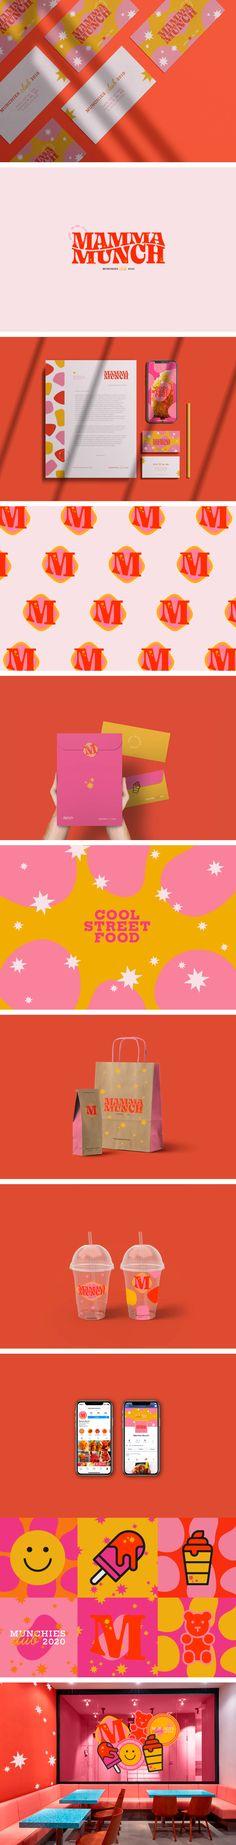 Food Graphic Design, Food Logo Design, Bakery Design, Logo Food, Brand Identity Design, Graphic Design Branding, Brand Design, Graphic Design Inspiration, Bakery Branding